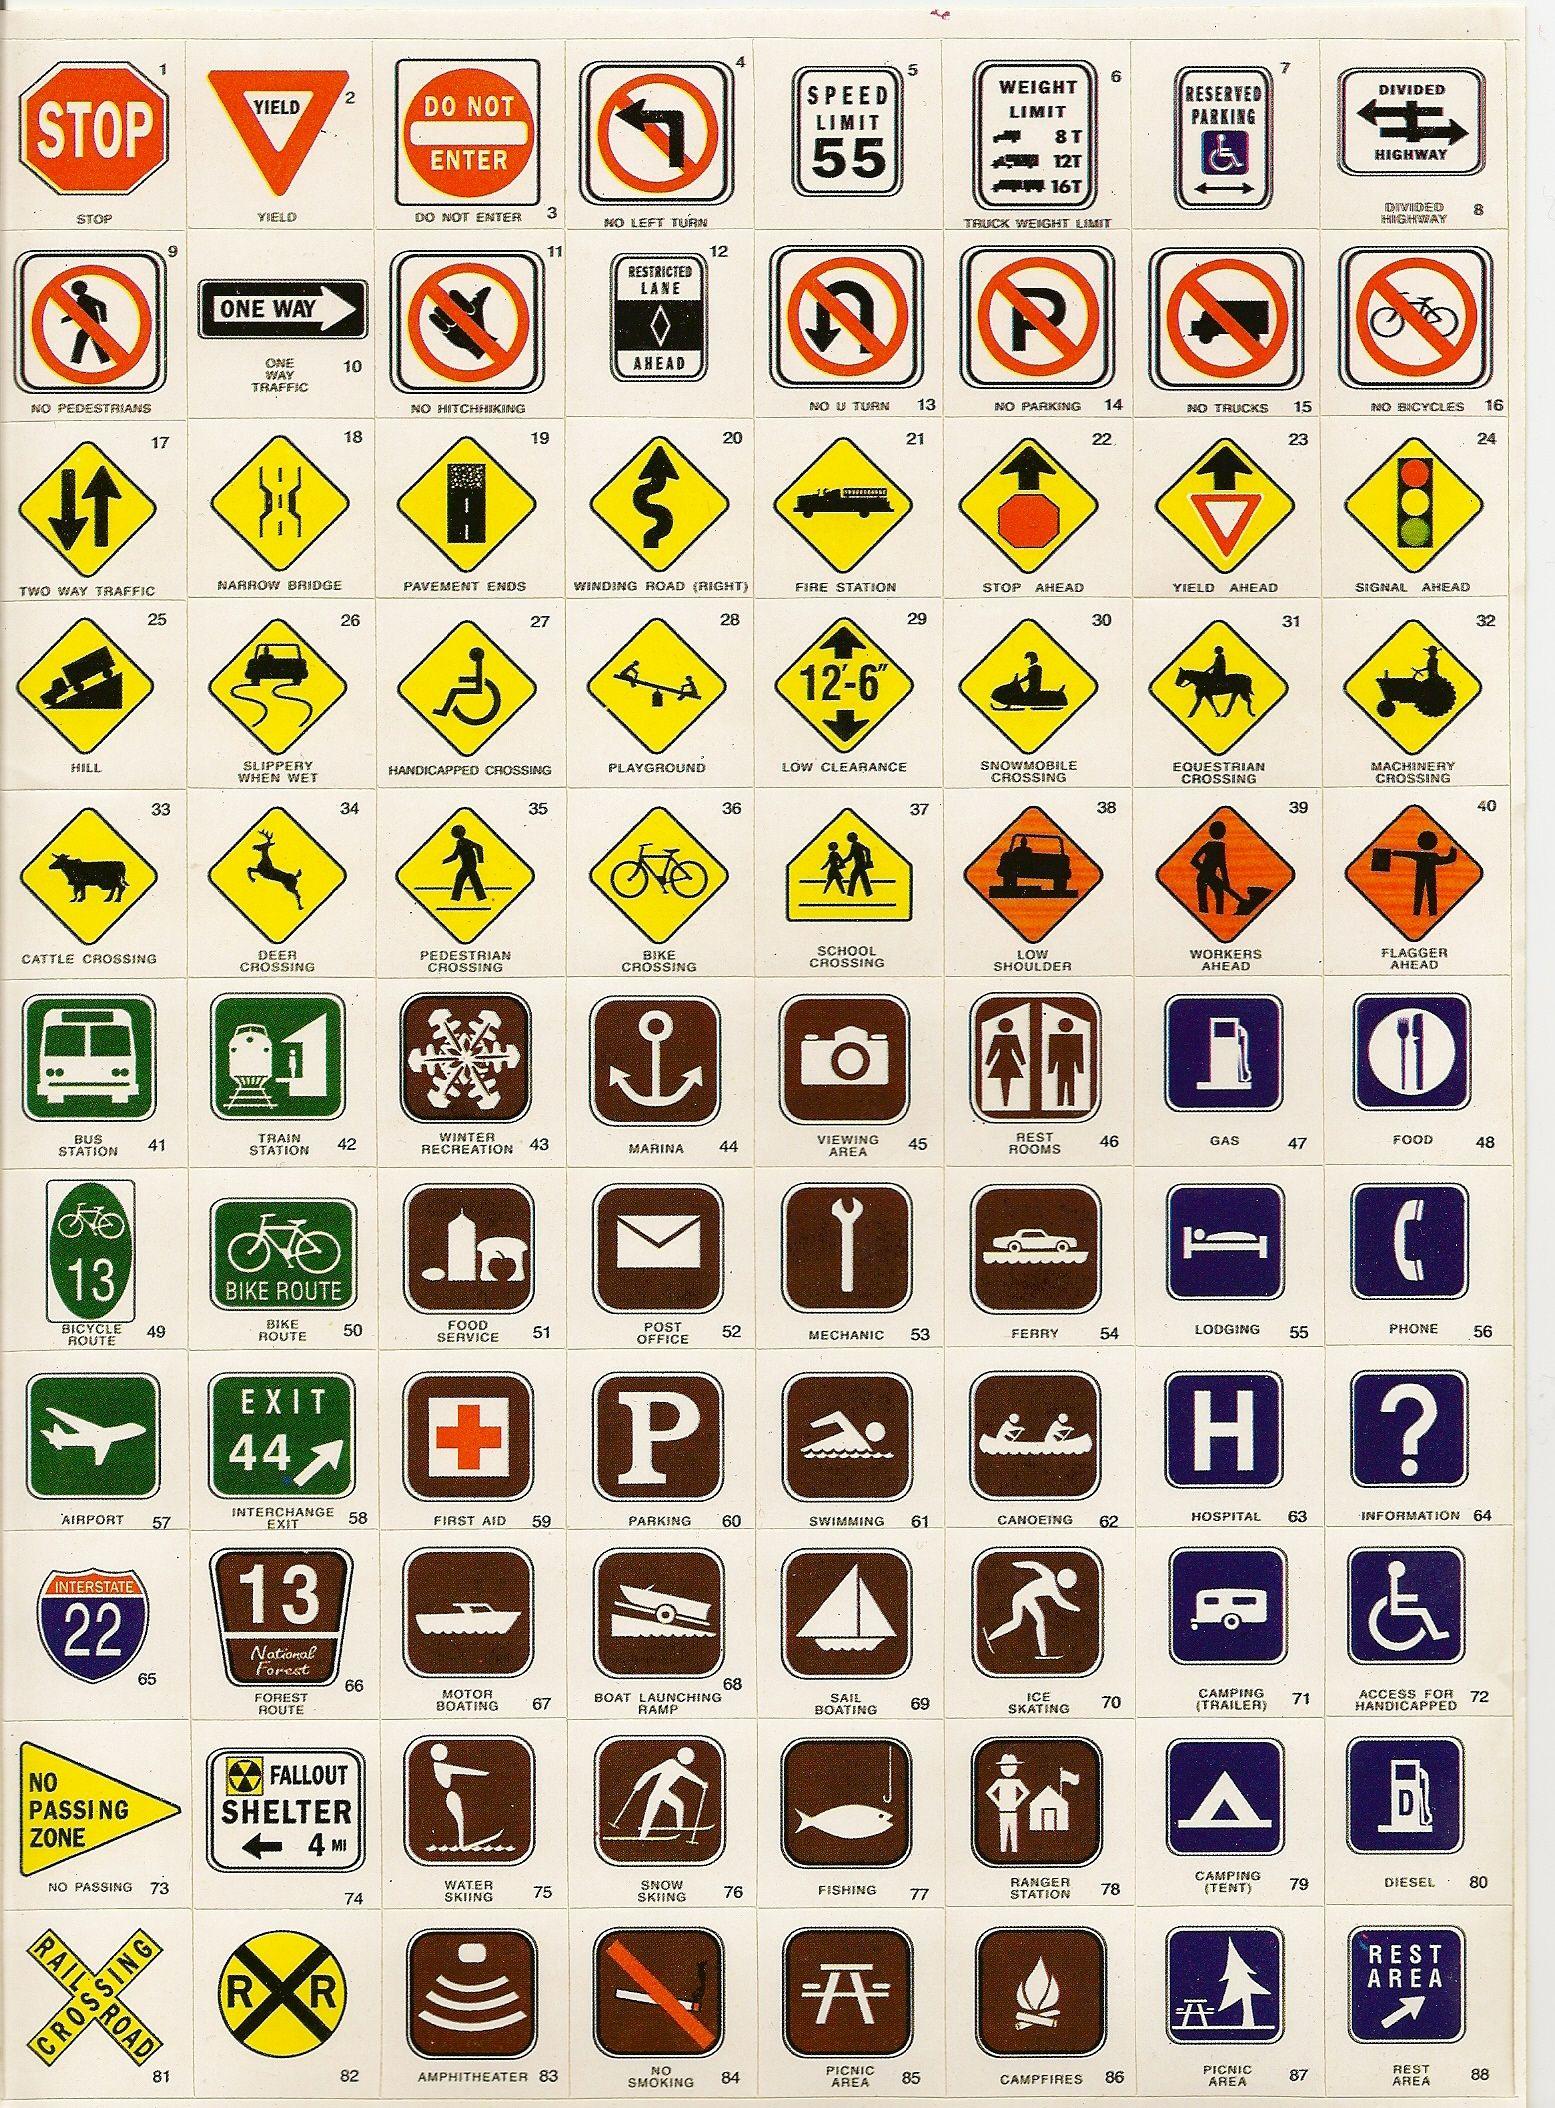 Pin by Shyla Ruffer Matthews on Road Trip! | Driving signs